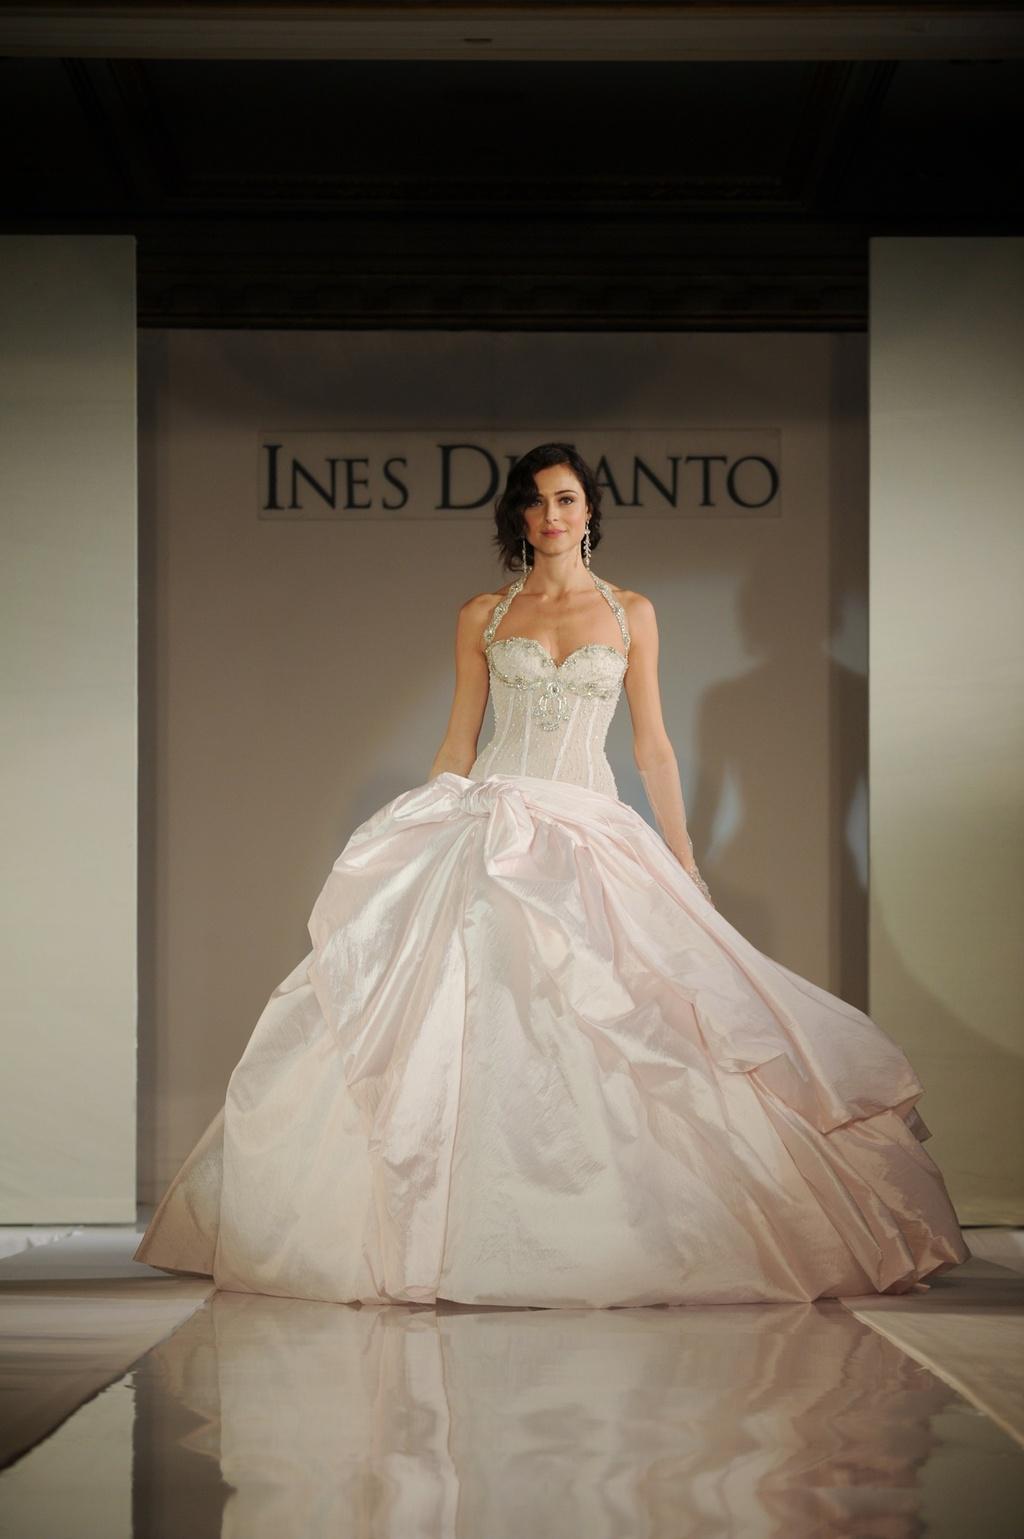 Ines-di-santo-wedding-dress-2012-bridal-gowns-1.full